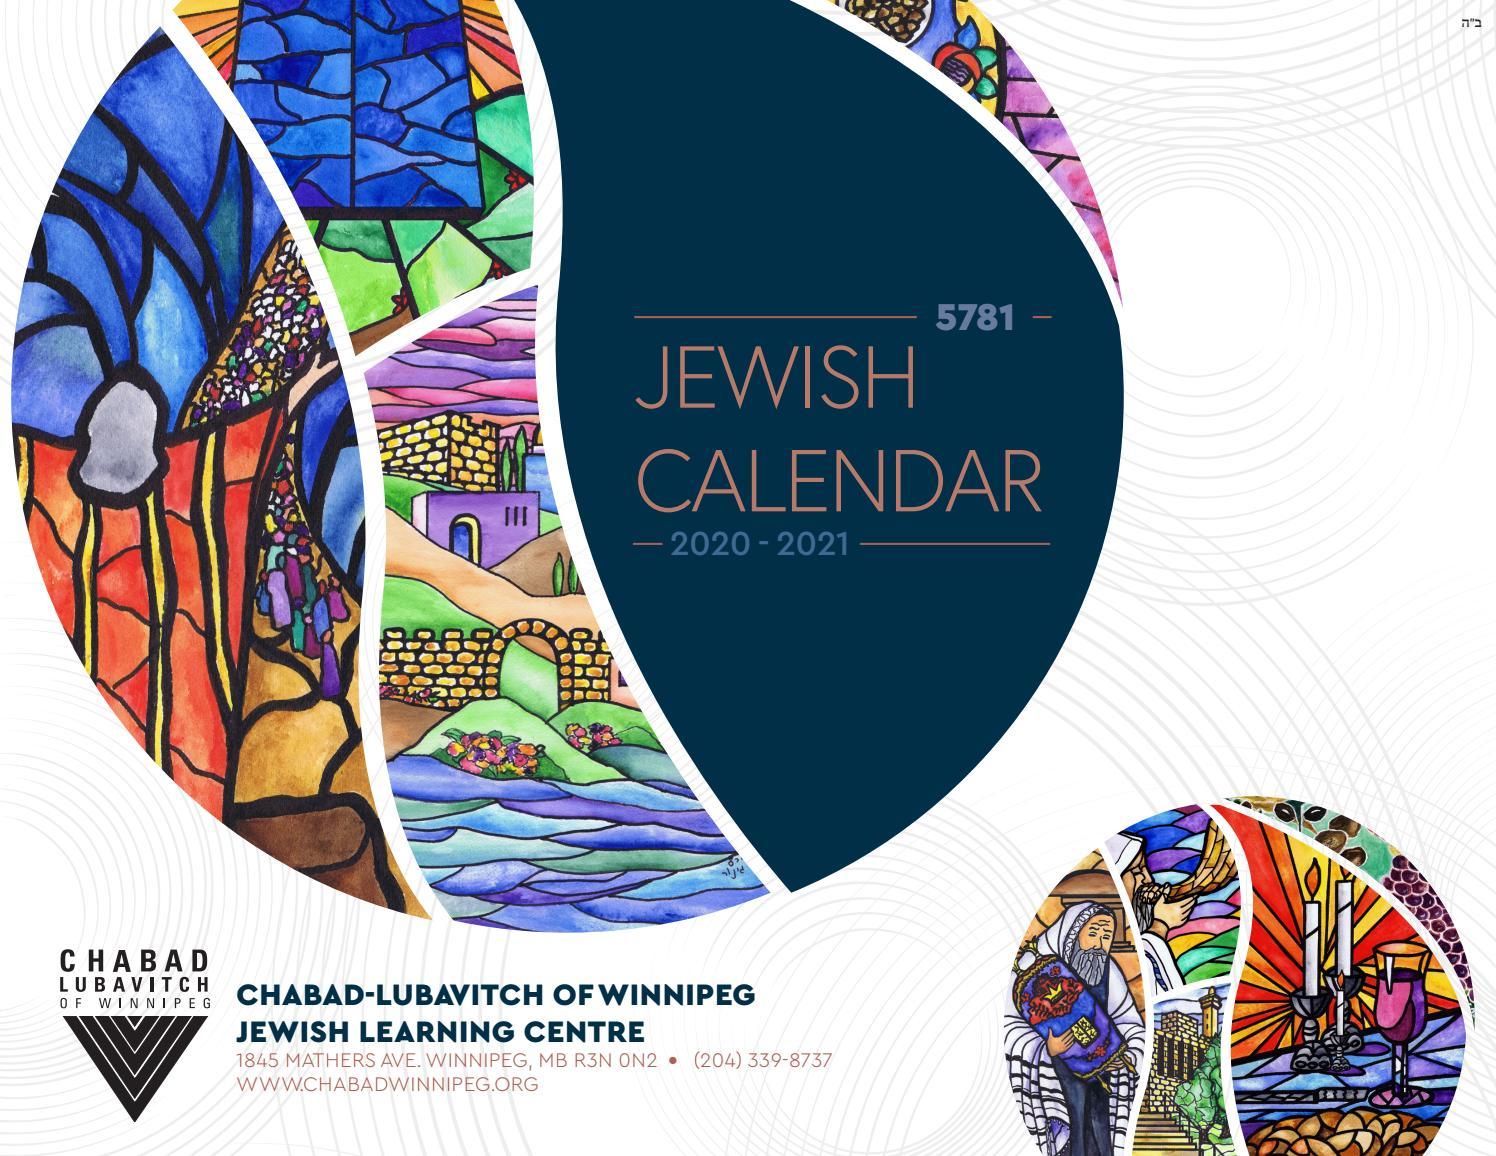 Jewish Calendar 2022 Chabad.Jewish Calendar 5781 By Chabad Lubavitch Of Winnipeg Issuu